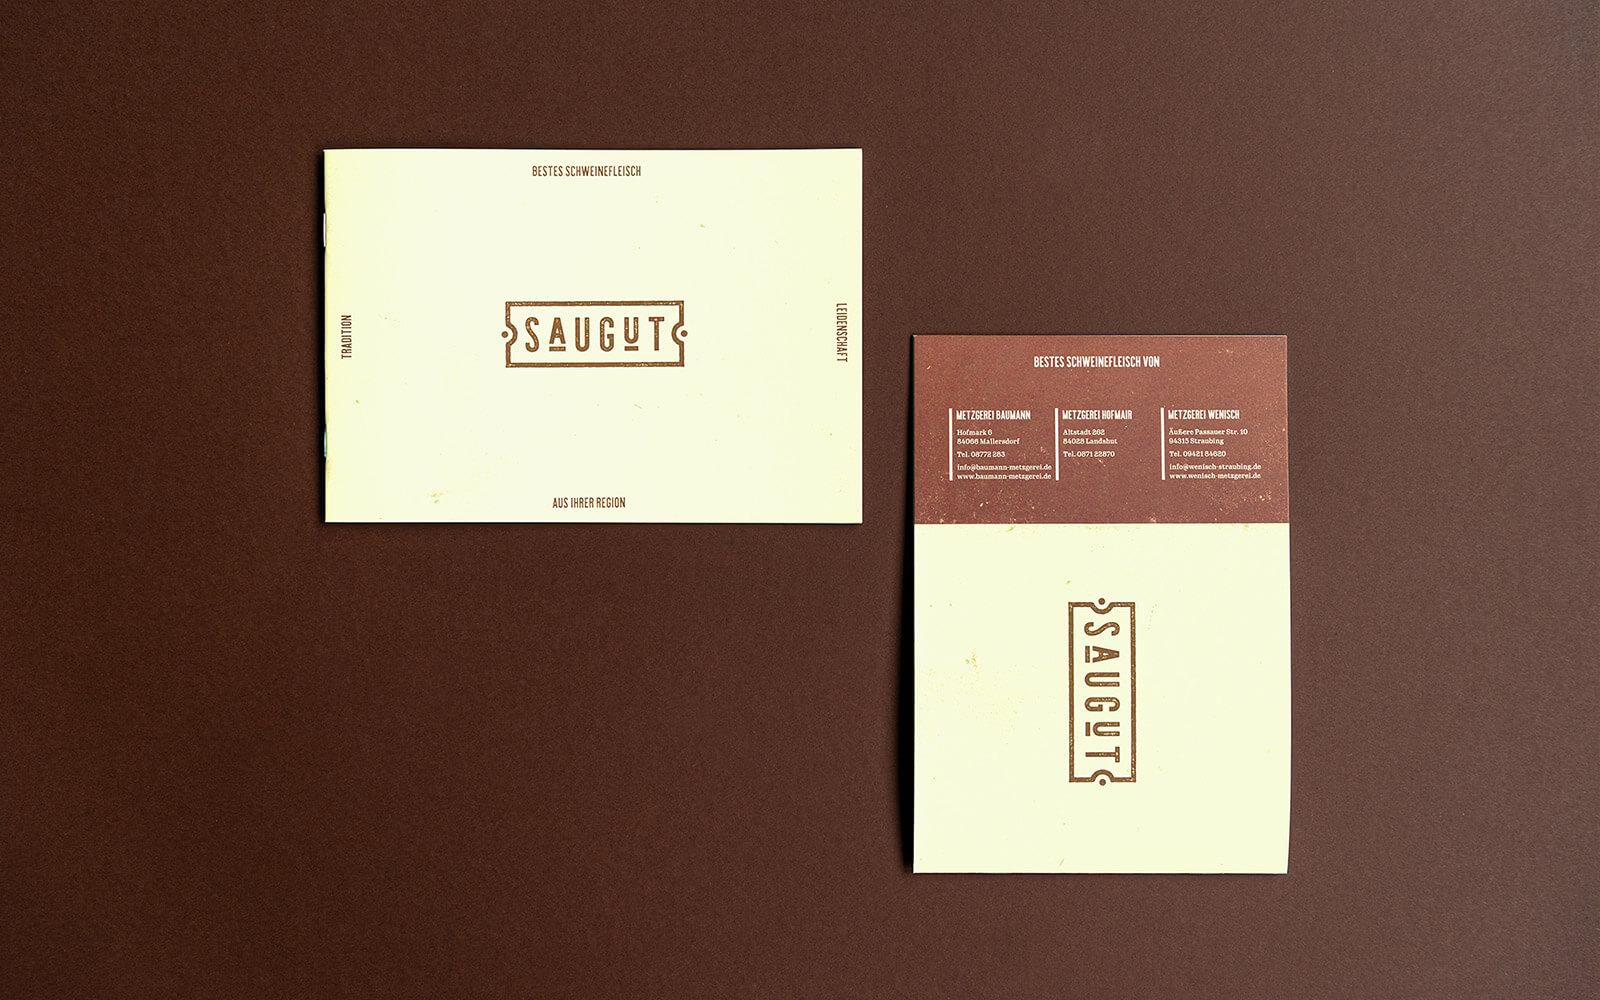 SAUGUT – Broschüre – Titel und Rücktitel